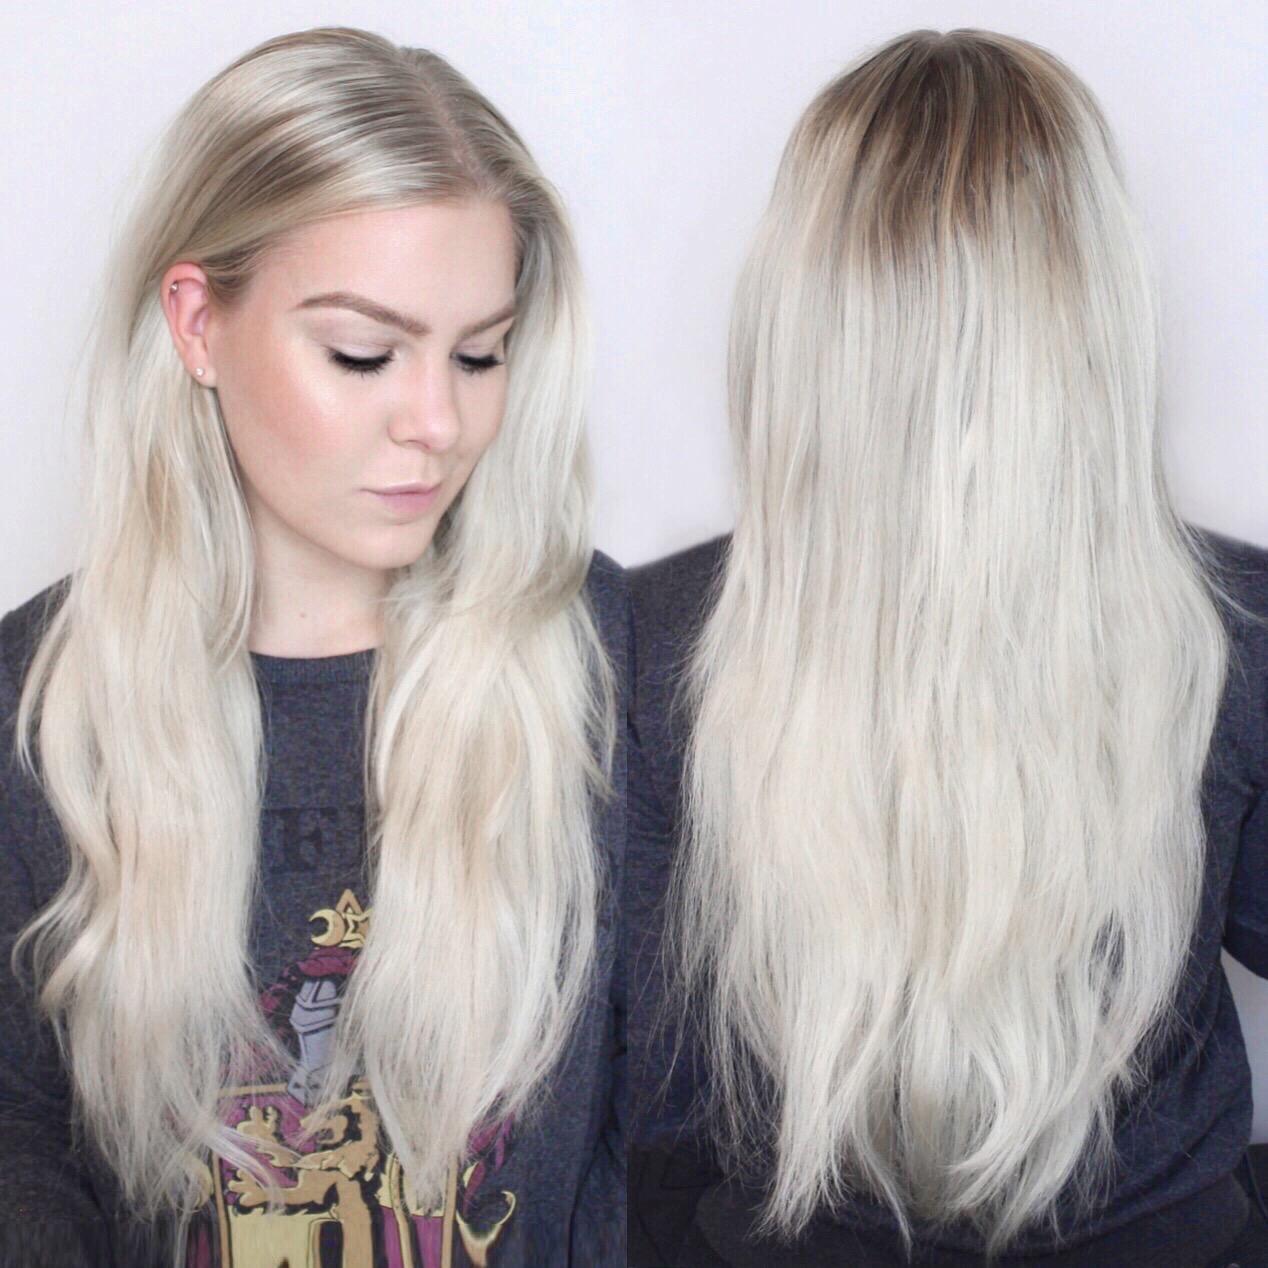 Foxylocks Hair Extensions 230g Hollywood Blonde Everyday Hair